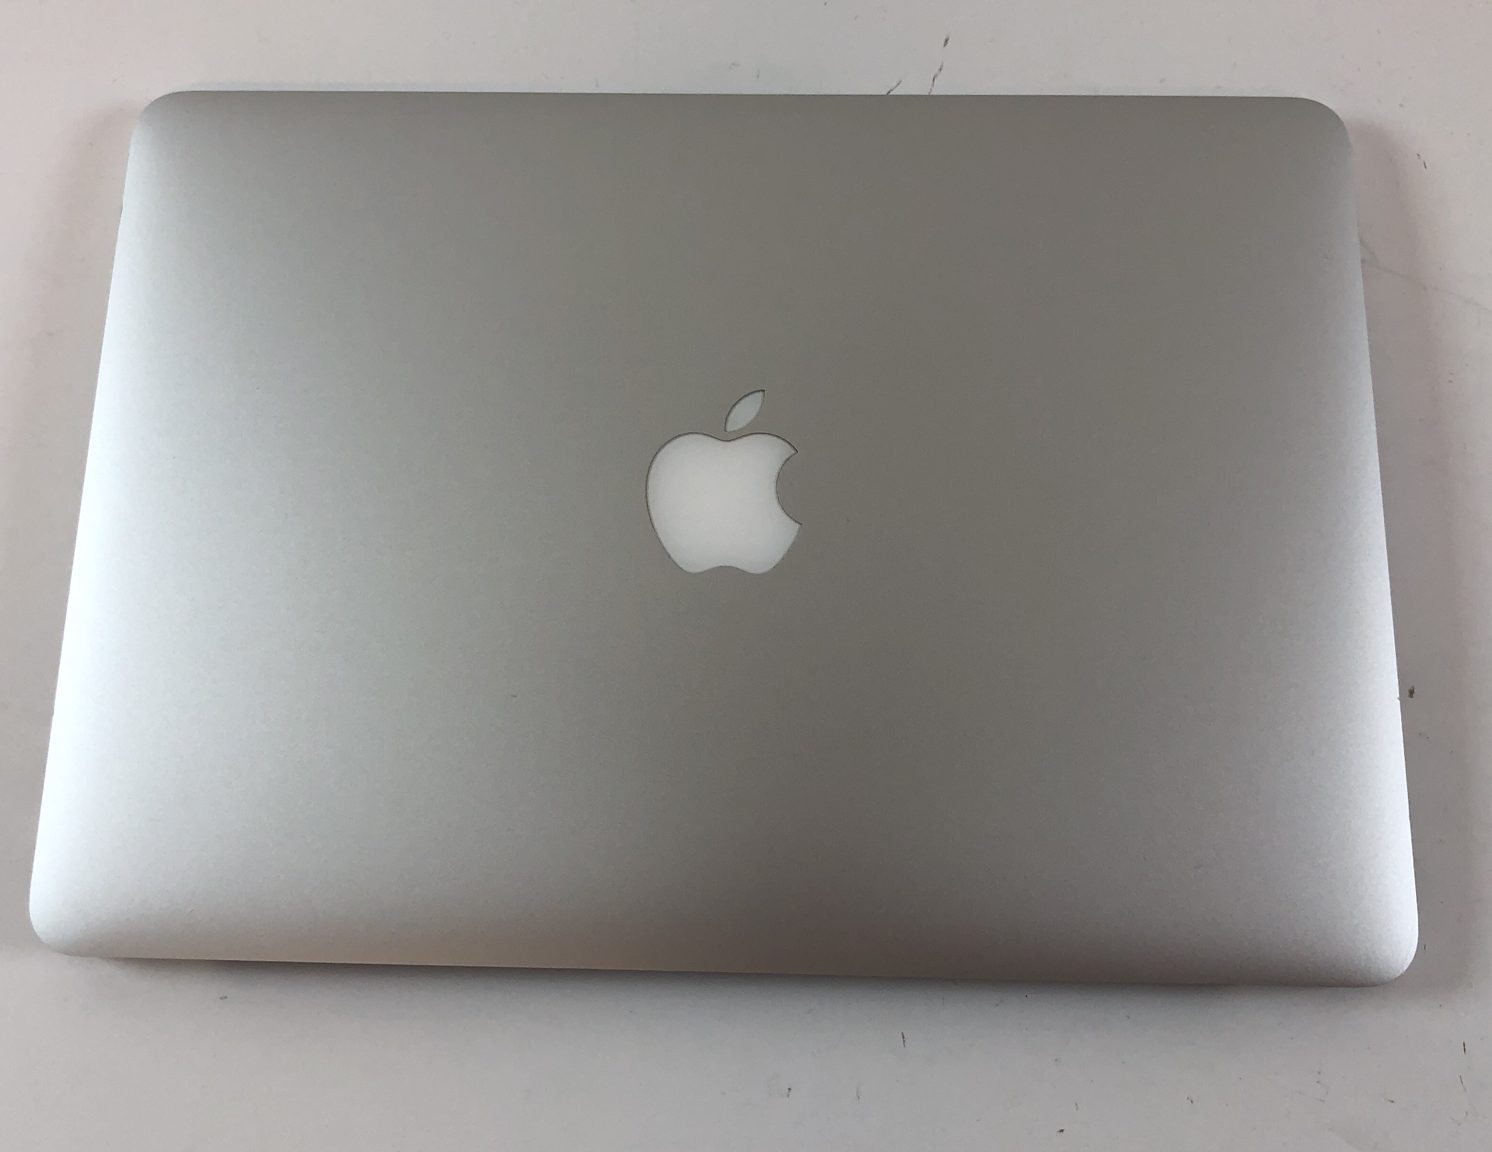 "MacBook Pro Retina 13"" Mid 2014 (Intel Core i5 2.6 GHz 8 GB RAM 128 GB SSD), Intel Core i5 2.6 GHz, 8 GB RAM, 128 GB SSD, bild 2"